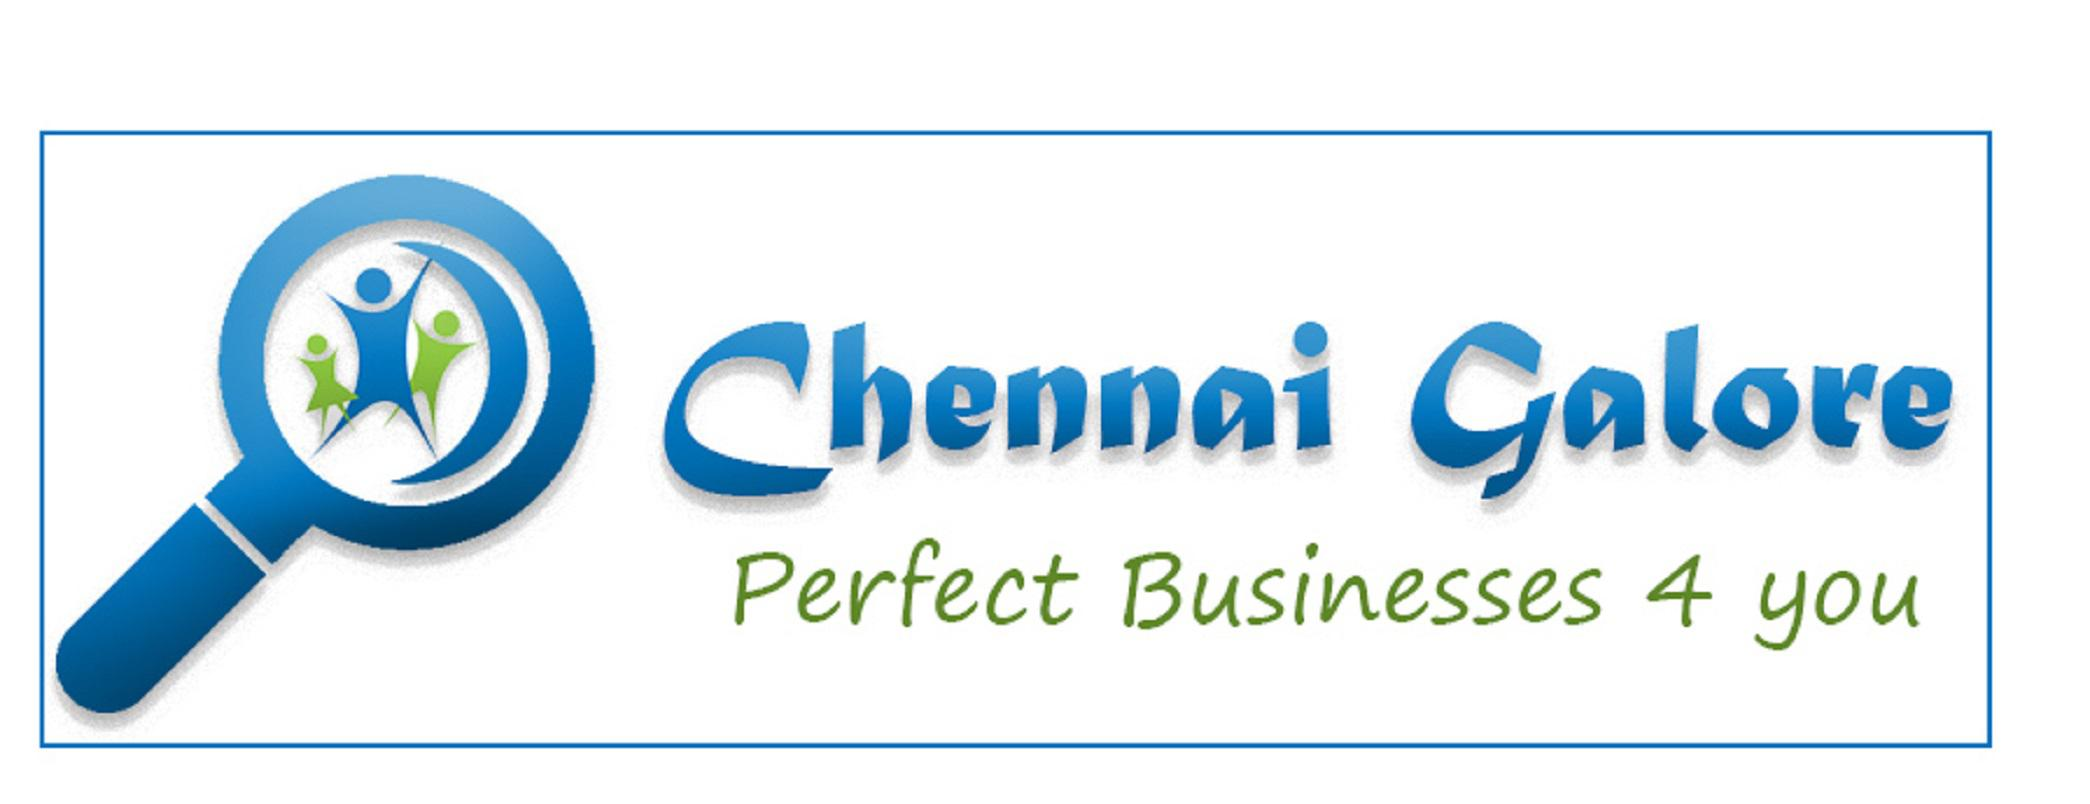 Chennai Galore